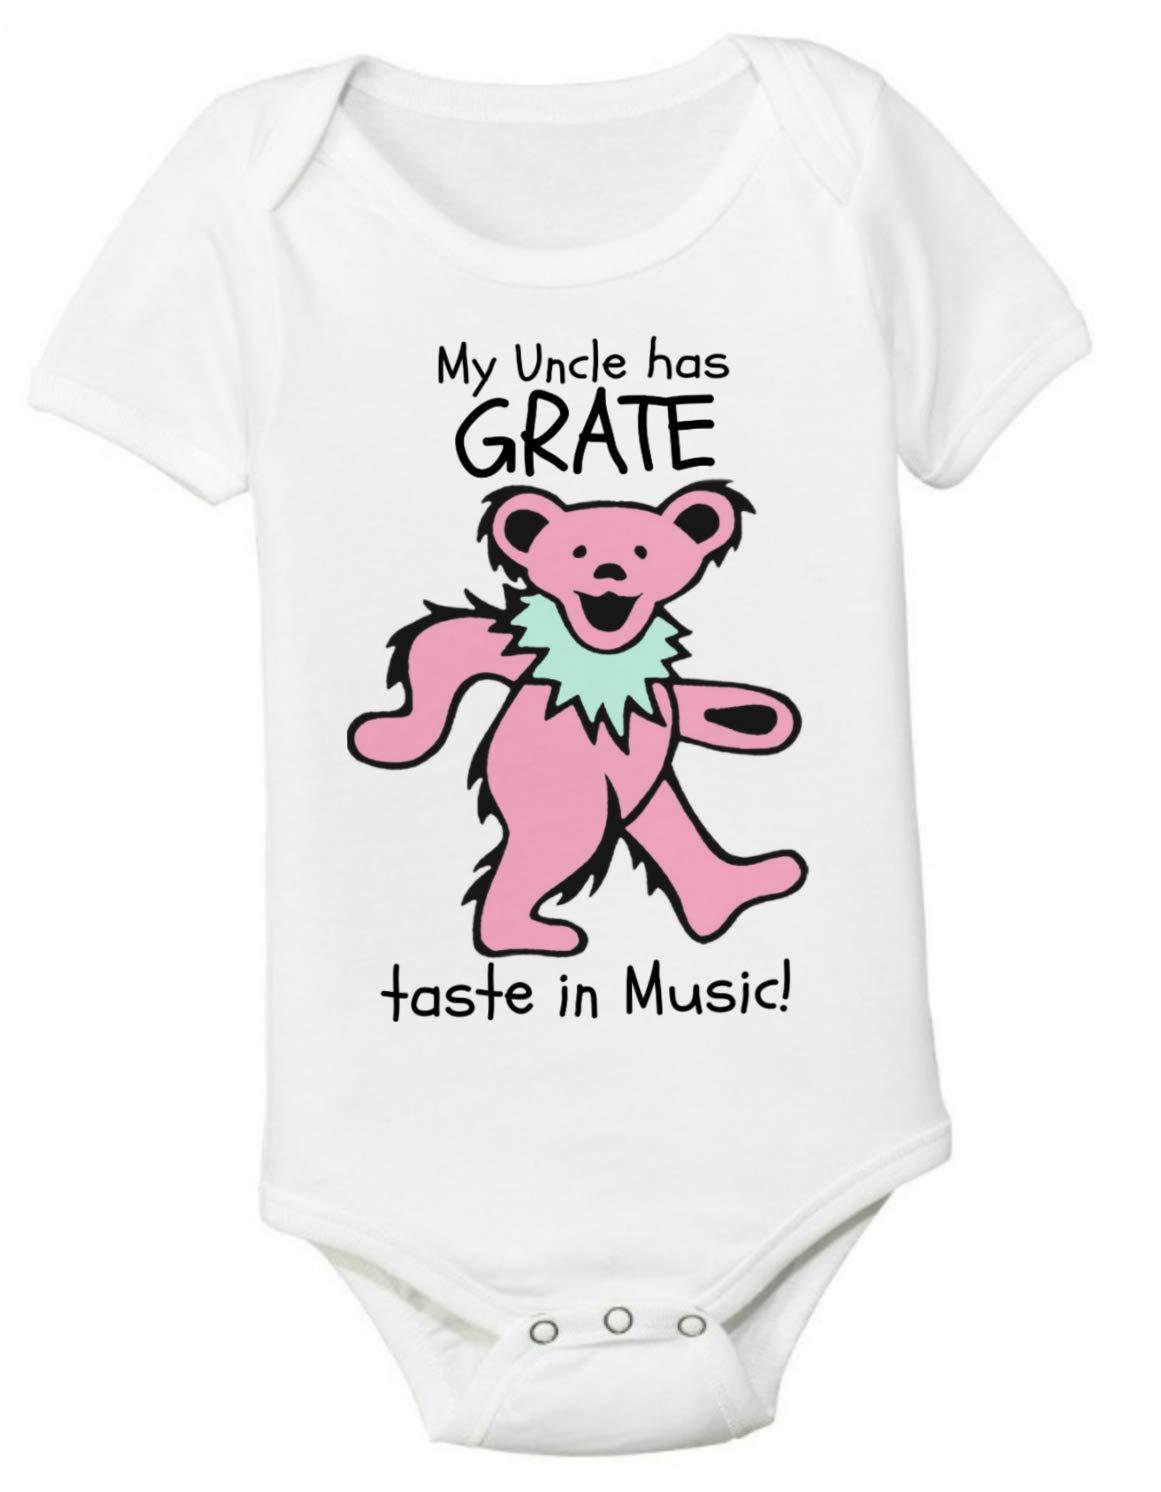 Grateful Shirt Unisex 3-6 Months Baby Award Onesie Grate My Many popular brands has Uncle